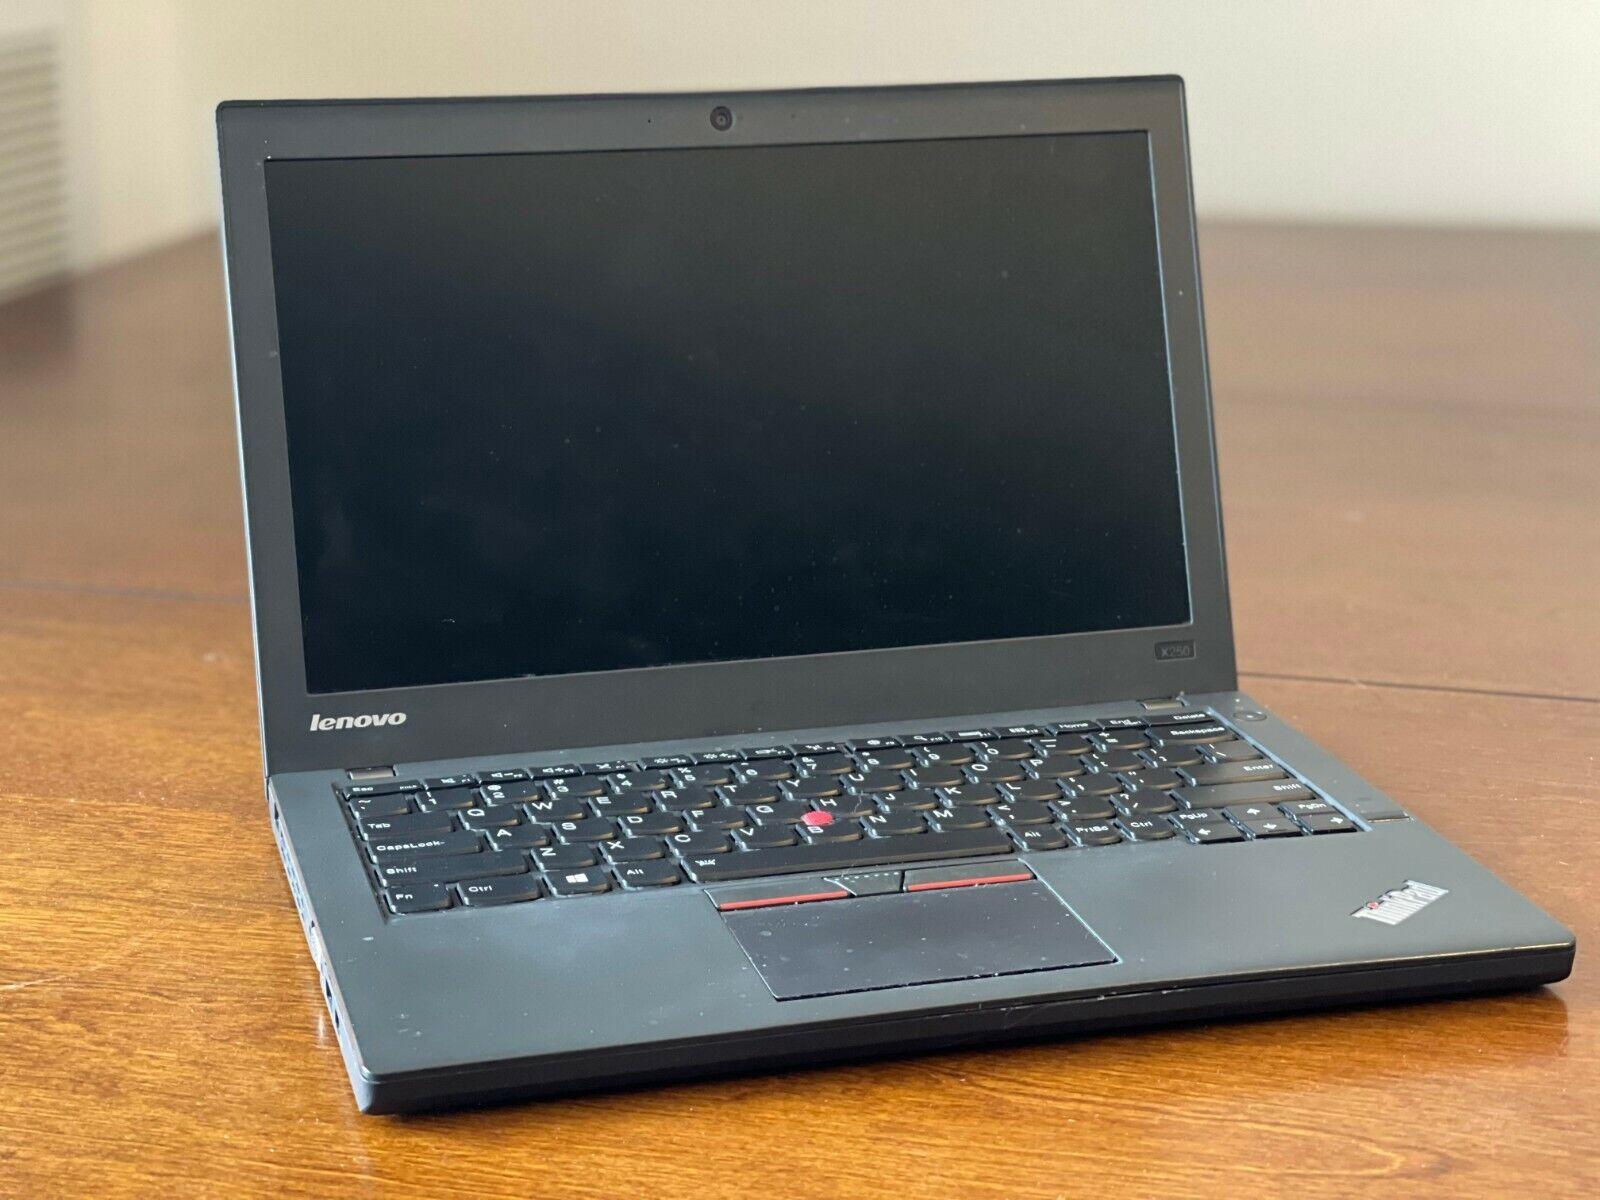 Lenovo X250, Intel Core I5, 8gb RAM, 256GB SSD. Windows 10 Pro - $200.00